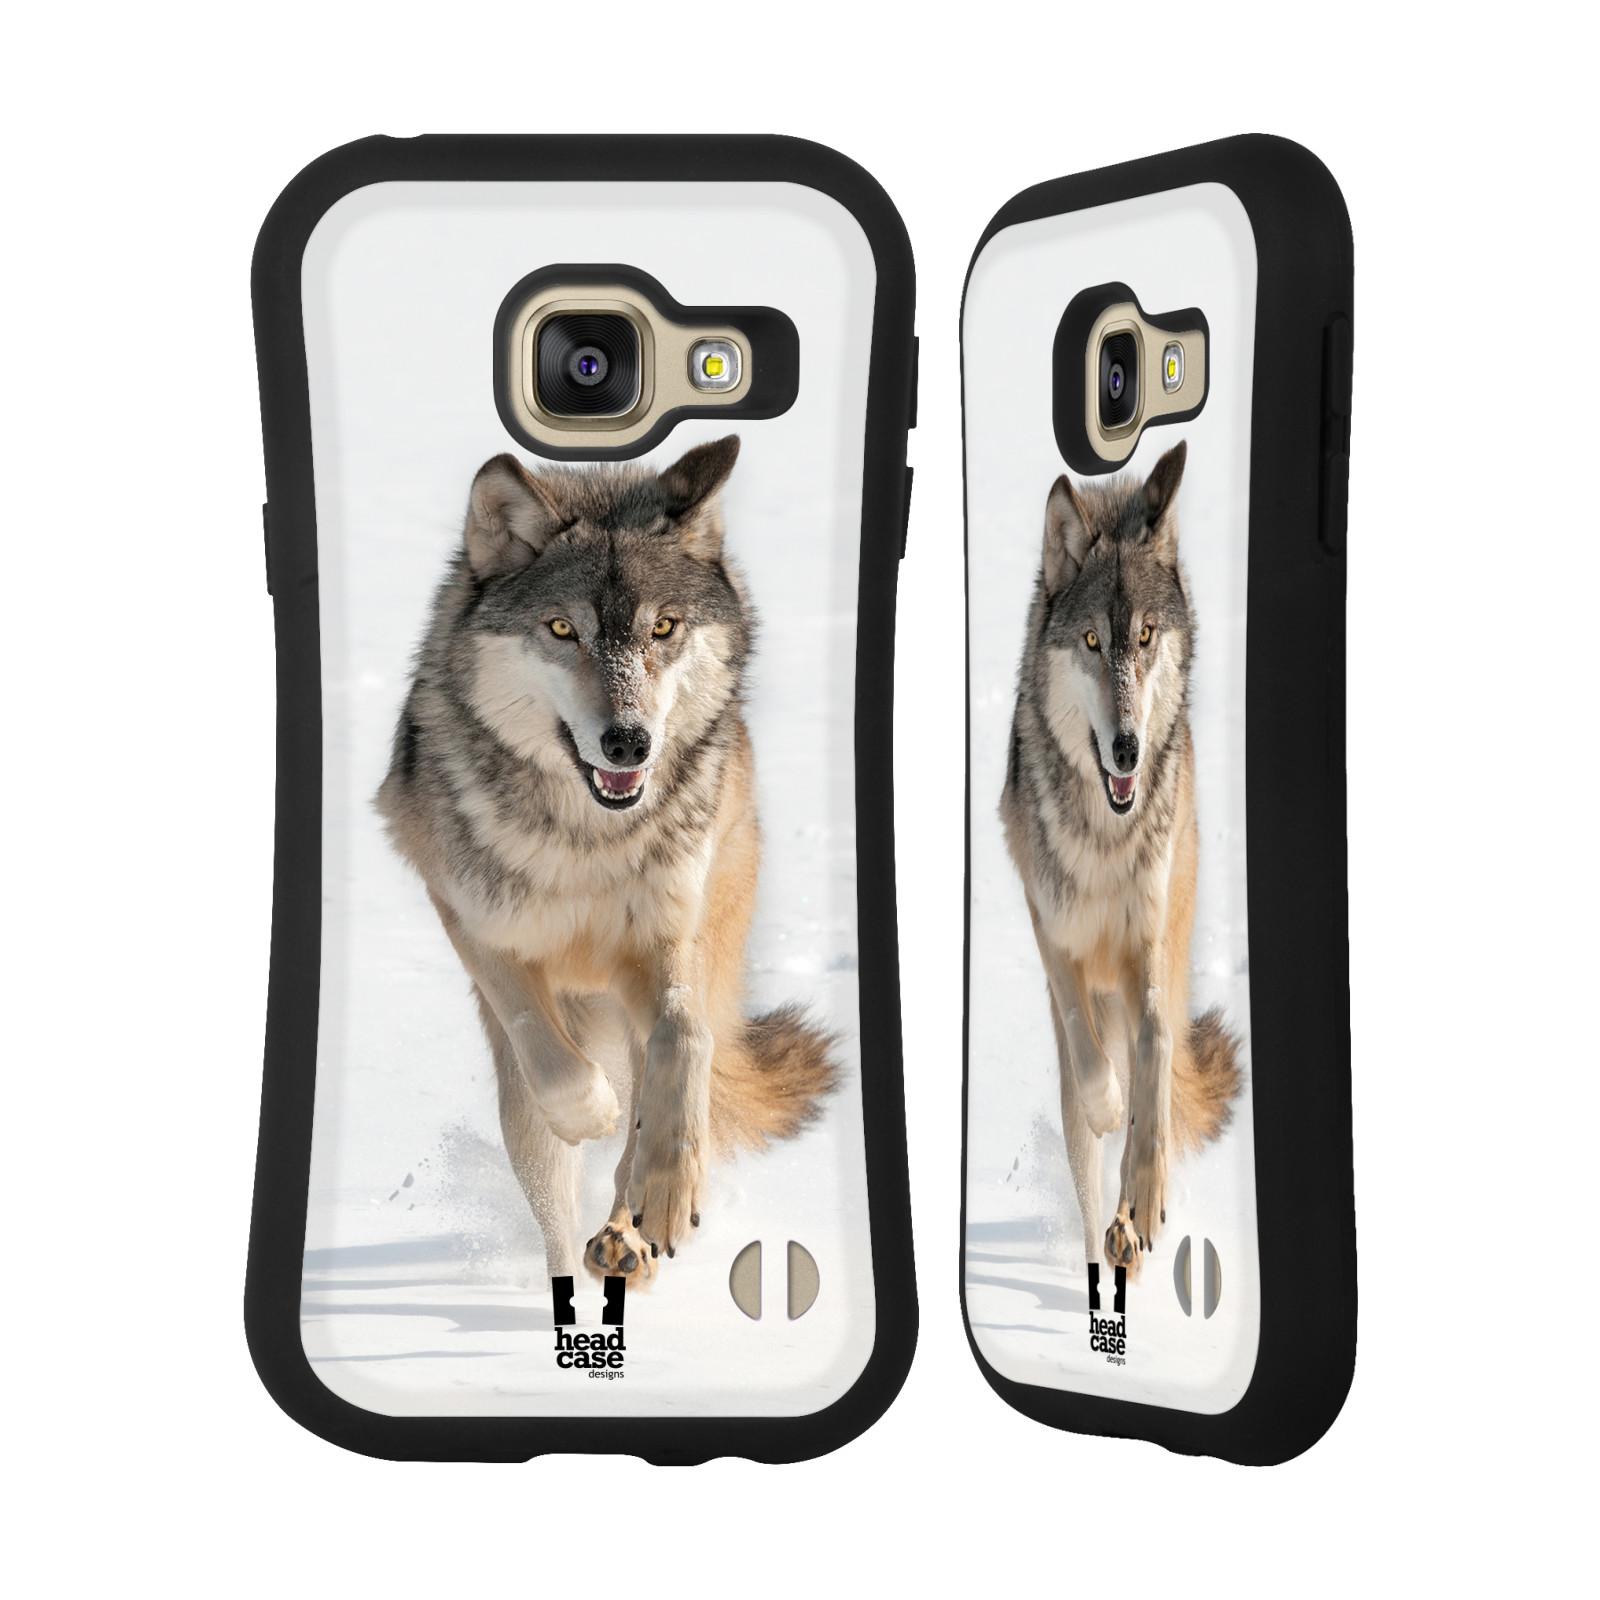 HEAD CASE silikon/plast odolný obal na mobil Samsung Galaxy A3 2016 vzor Divočina, Divoký život a zvířata foto BĚŽÍCÍ VLK